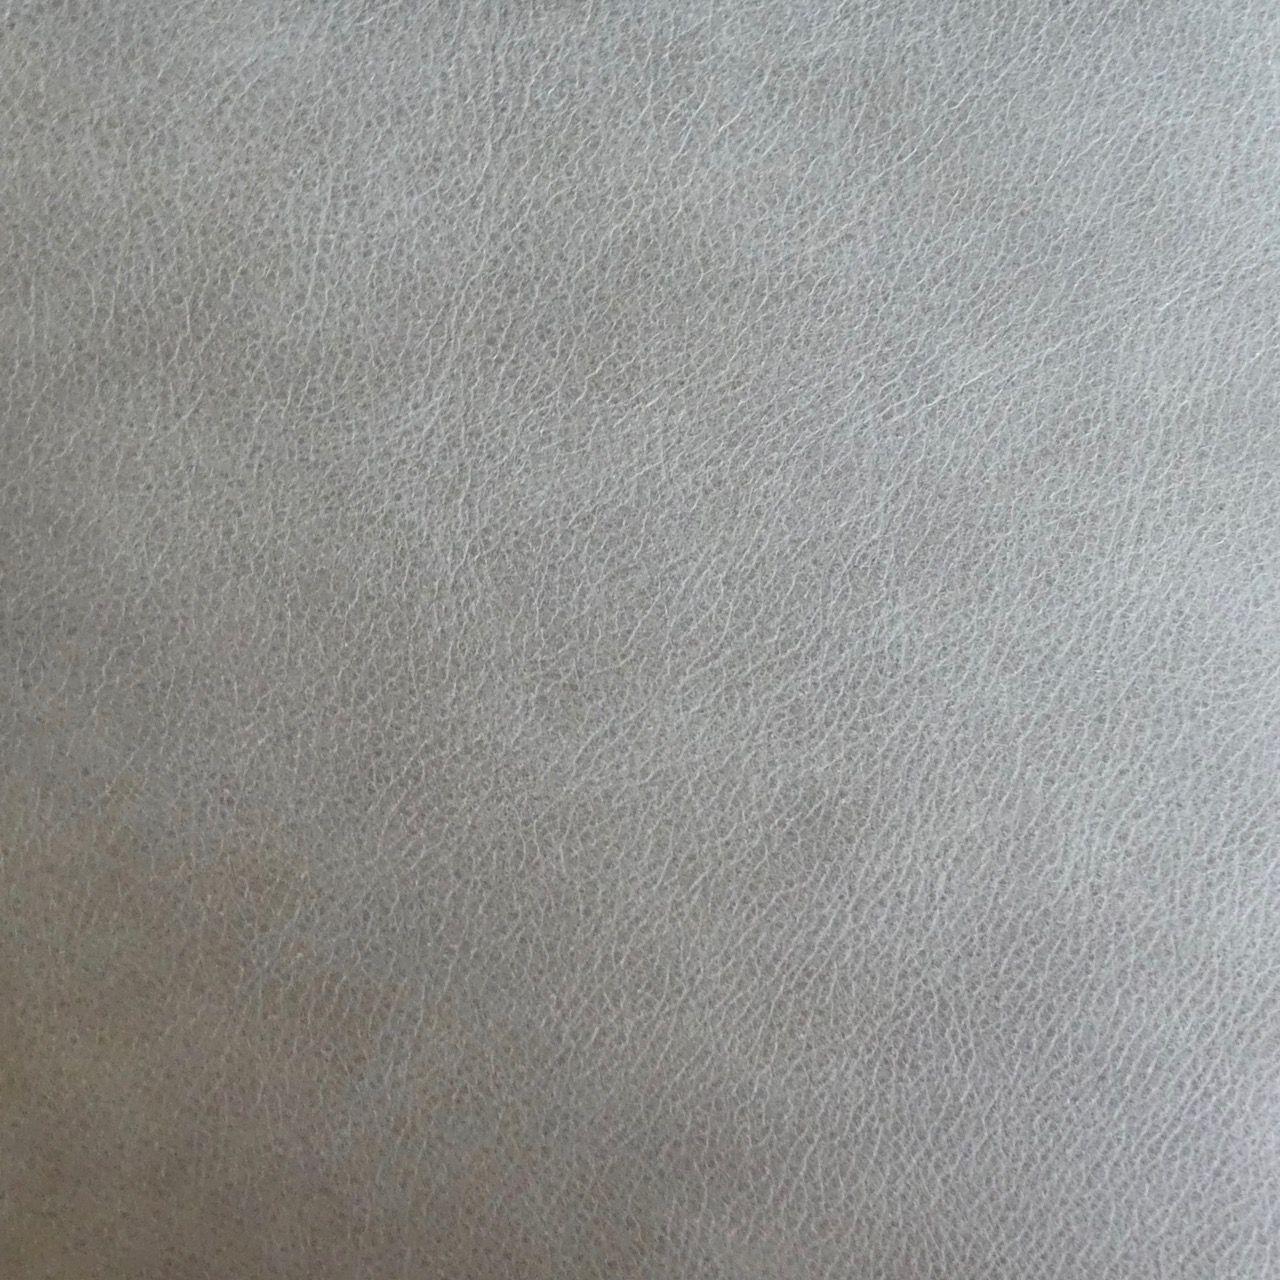 Antigo Taupe - Leather